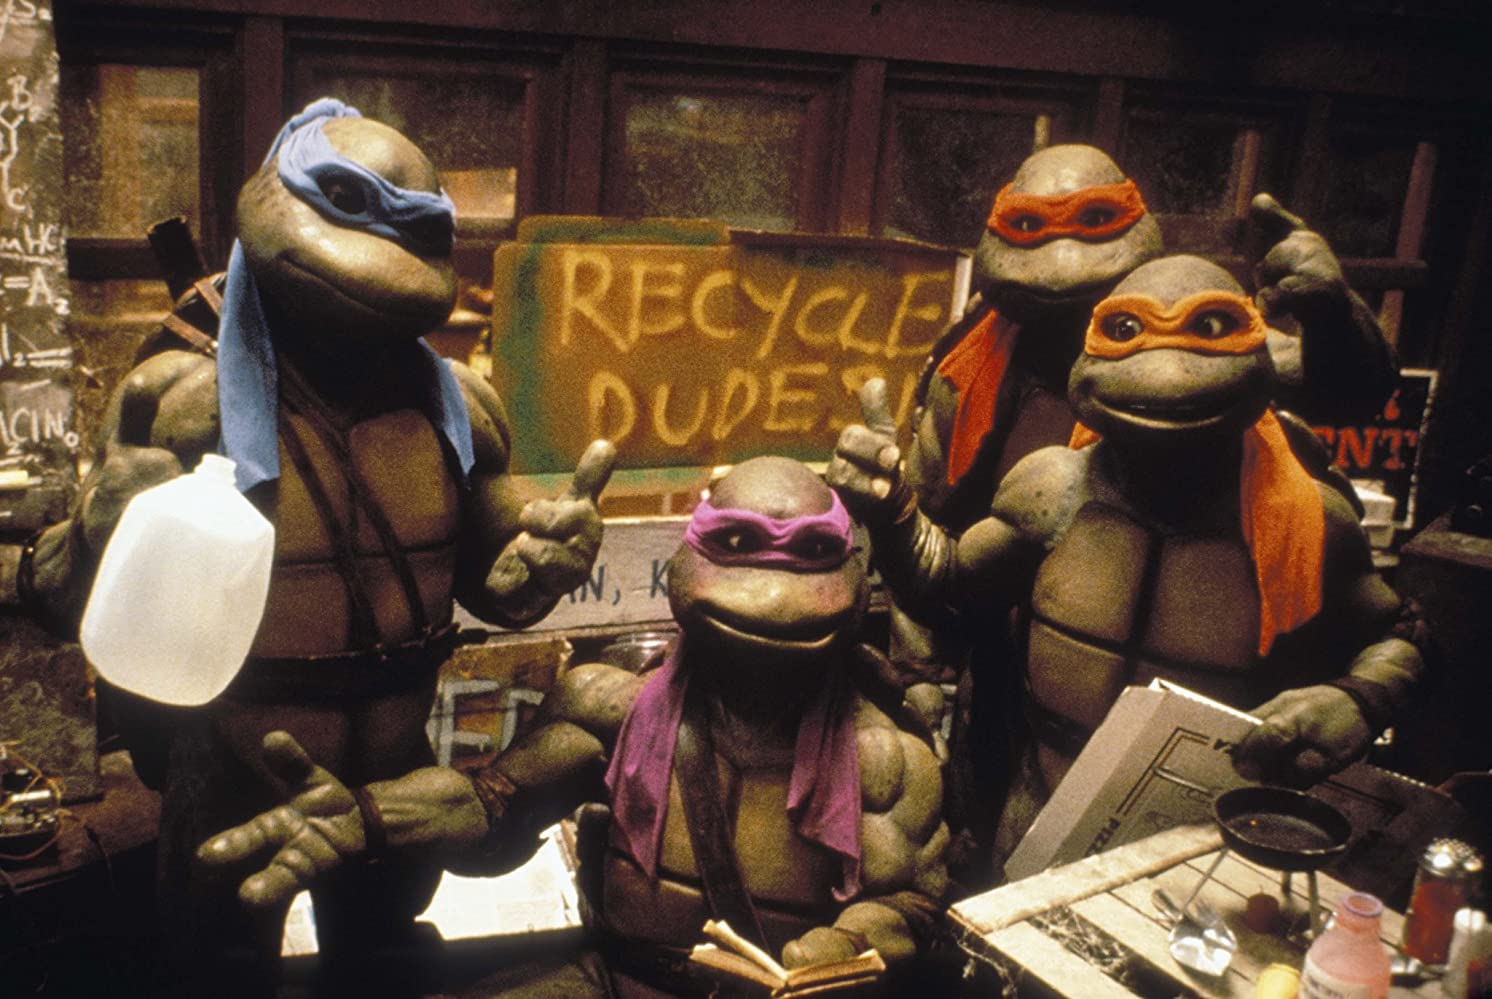 Retro review teenage mutant ninja turtles ii secret of the ooze - Retro Review Teenage Mutant Ninja Turtles Ii Secret Of The Ooze 0